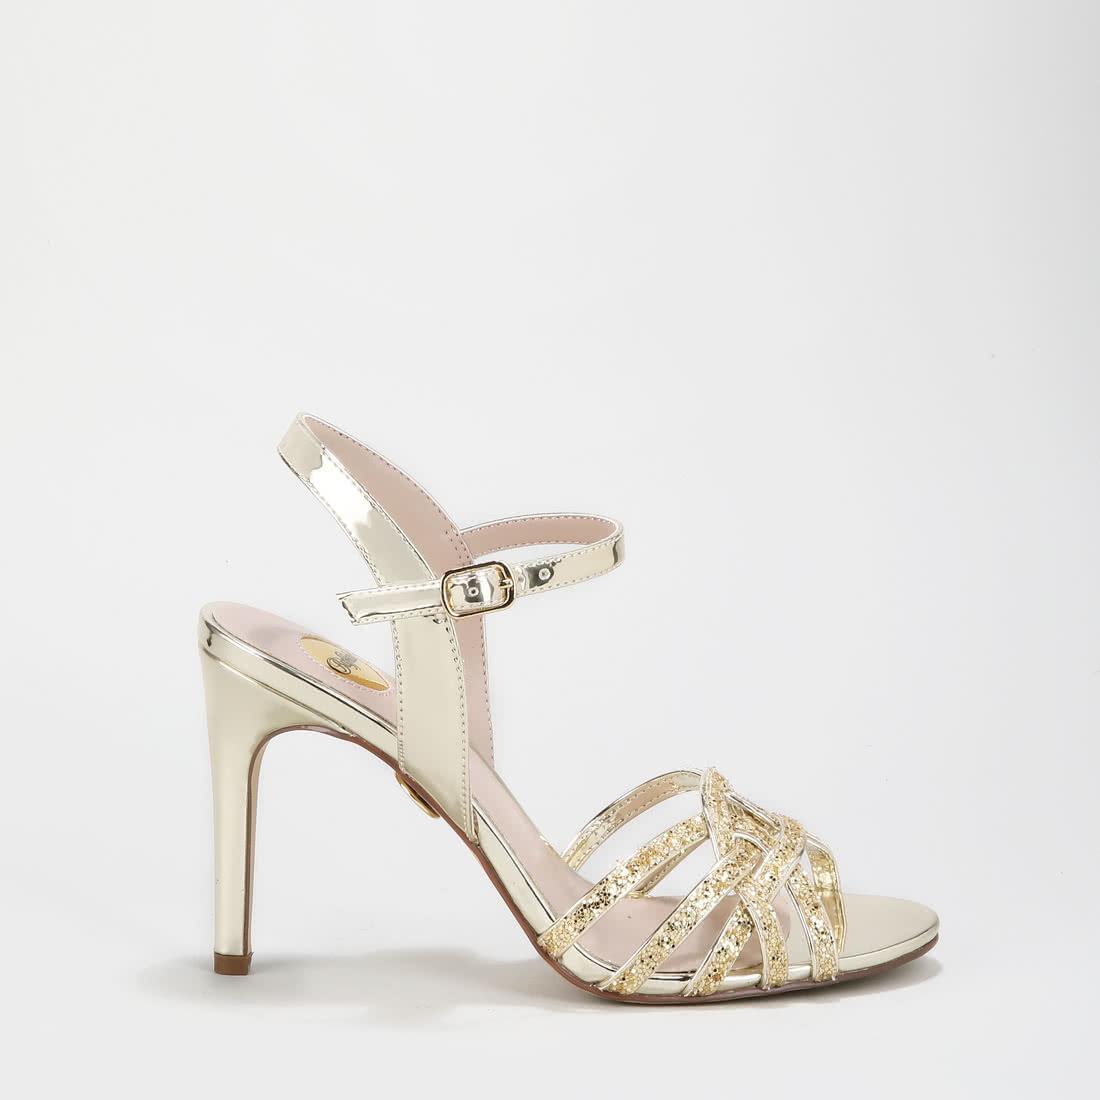 new arrival f1c3e cfef9 Afterglow Sandalette metallic-gold online kaufen | BUFFALO®